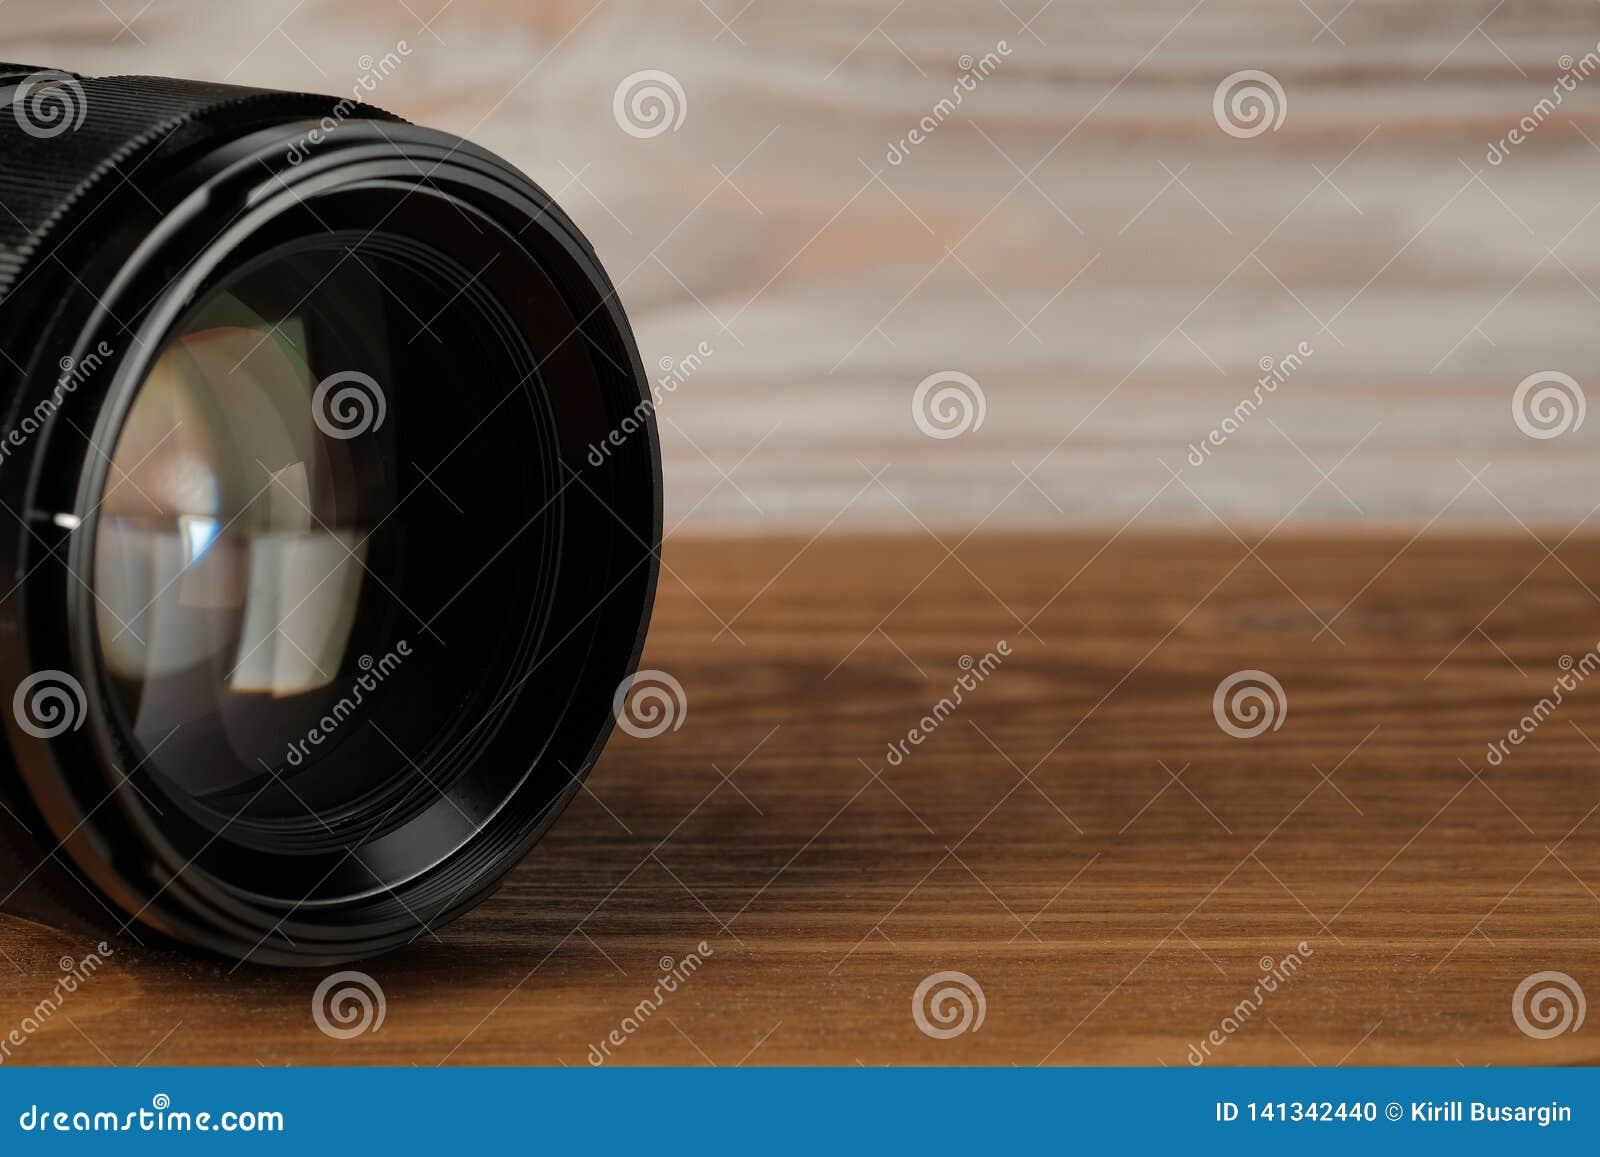 Lente de la foto de la cámara en la tabla de madera vieja